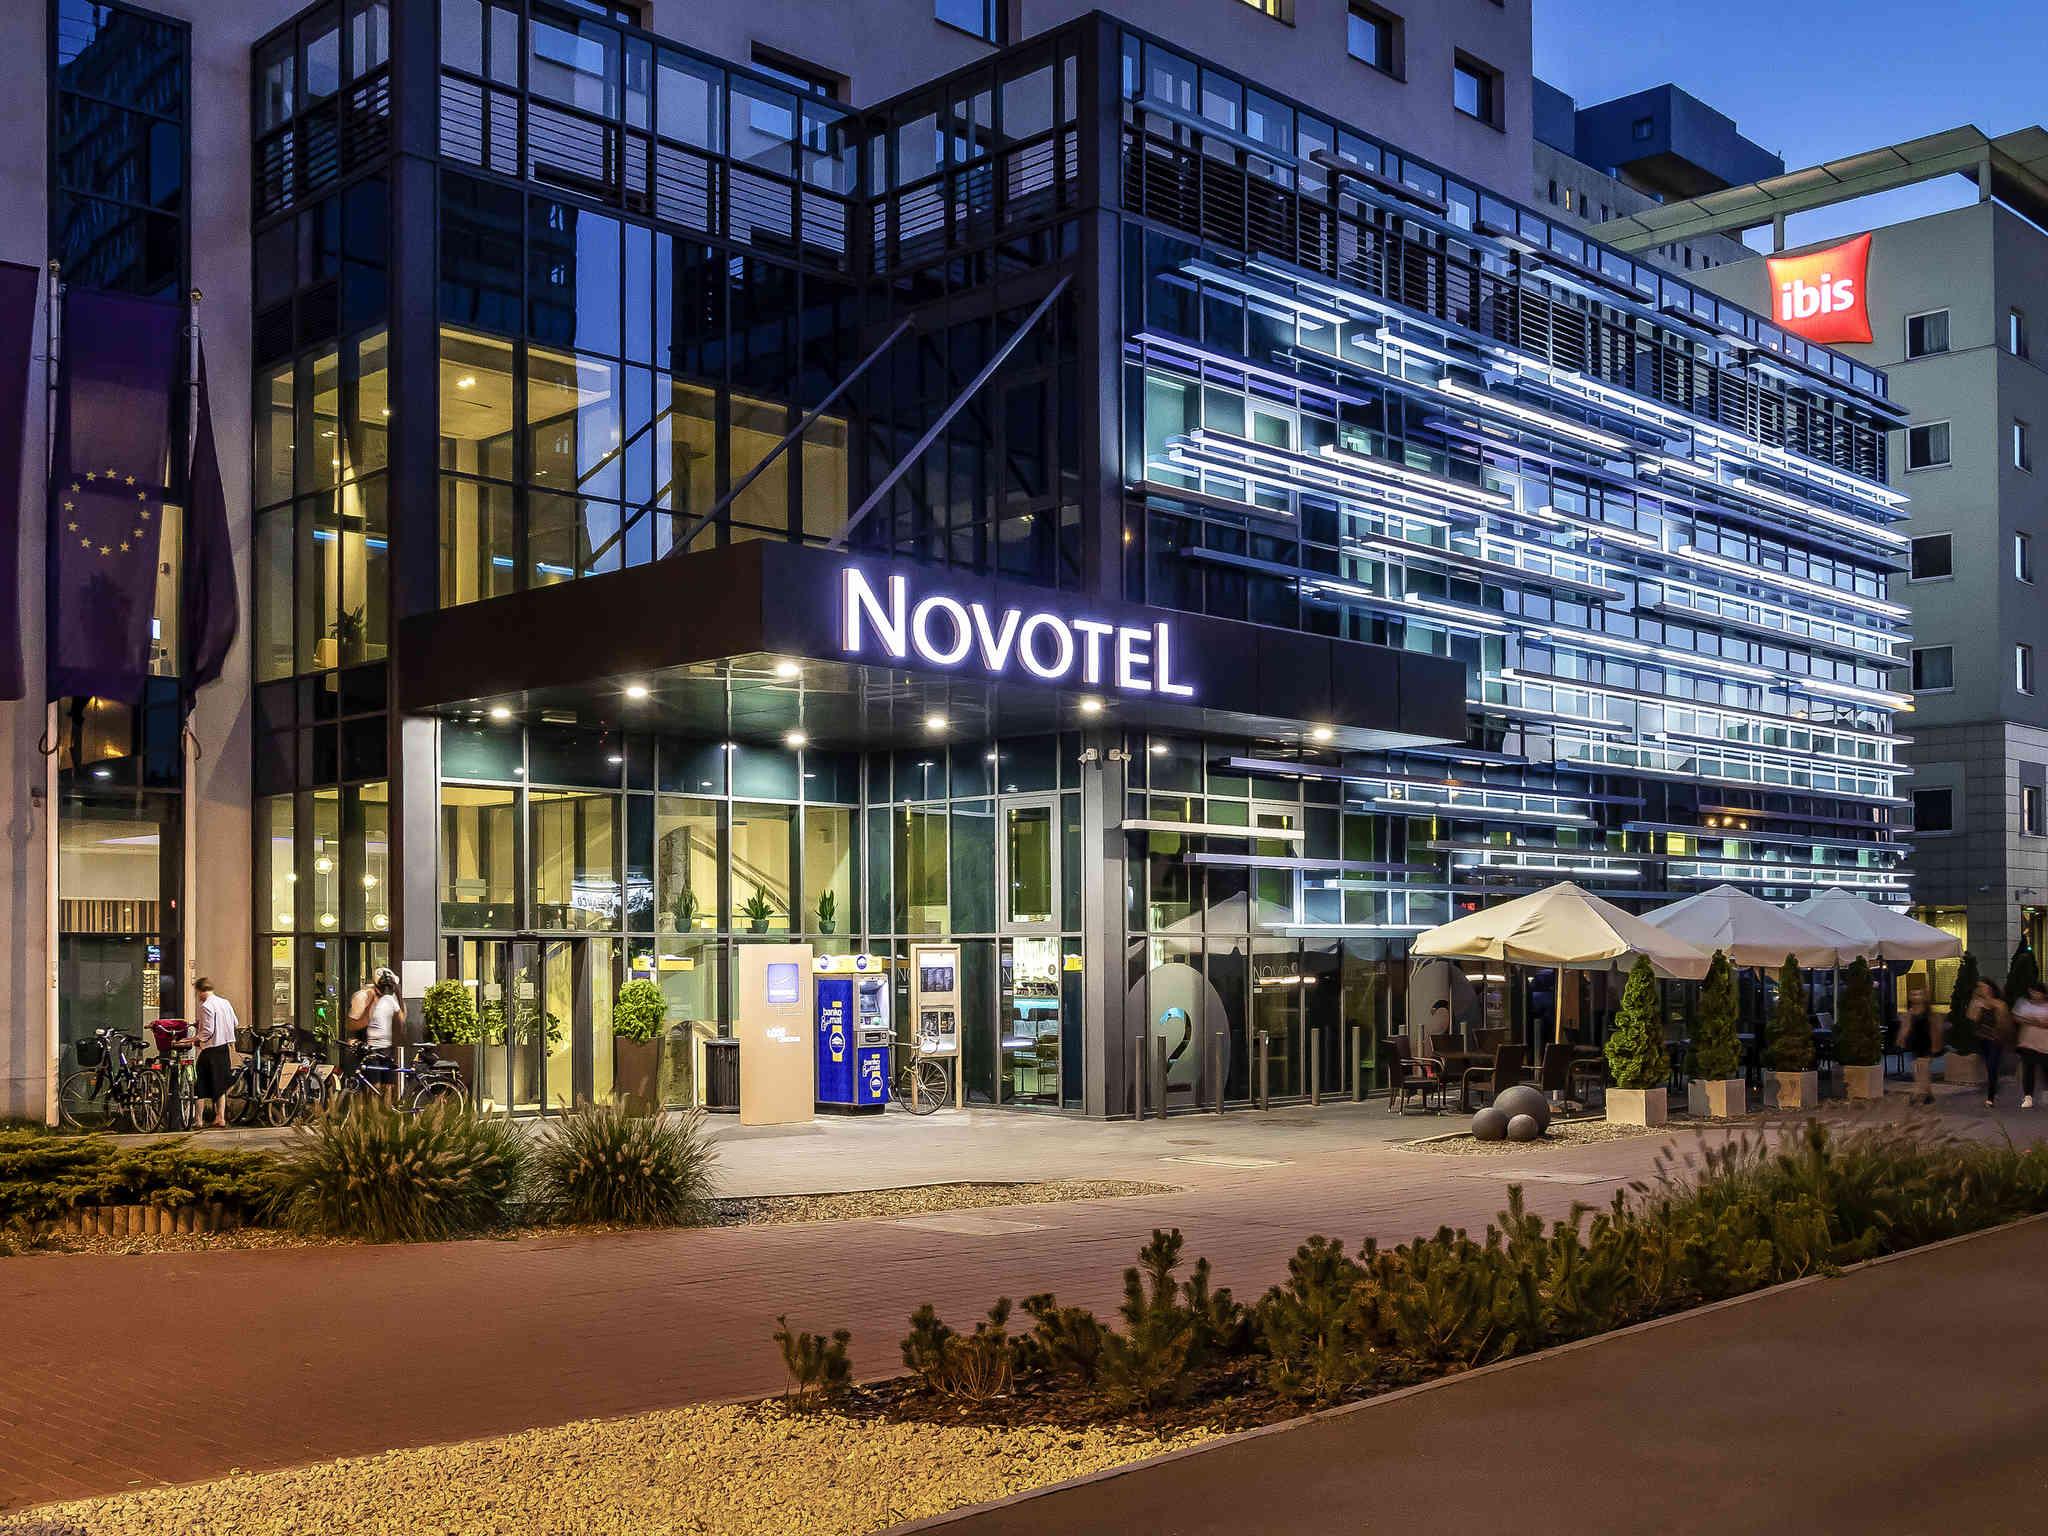 فندق - Novotel Lodz Centrum